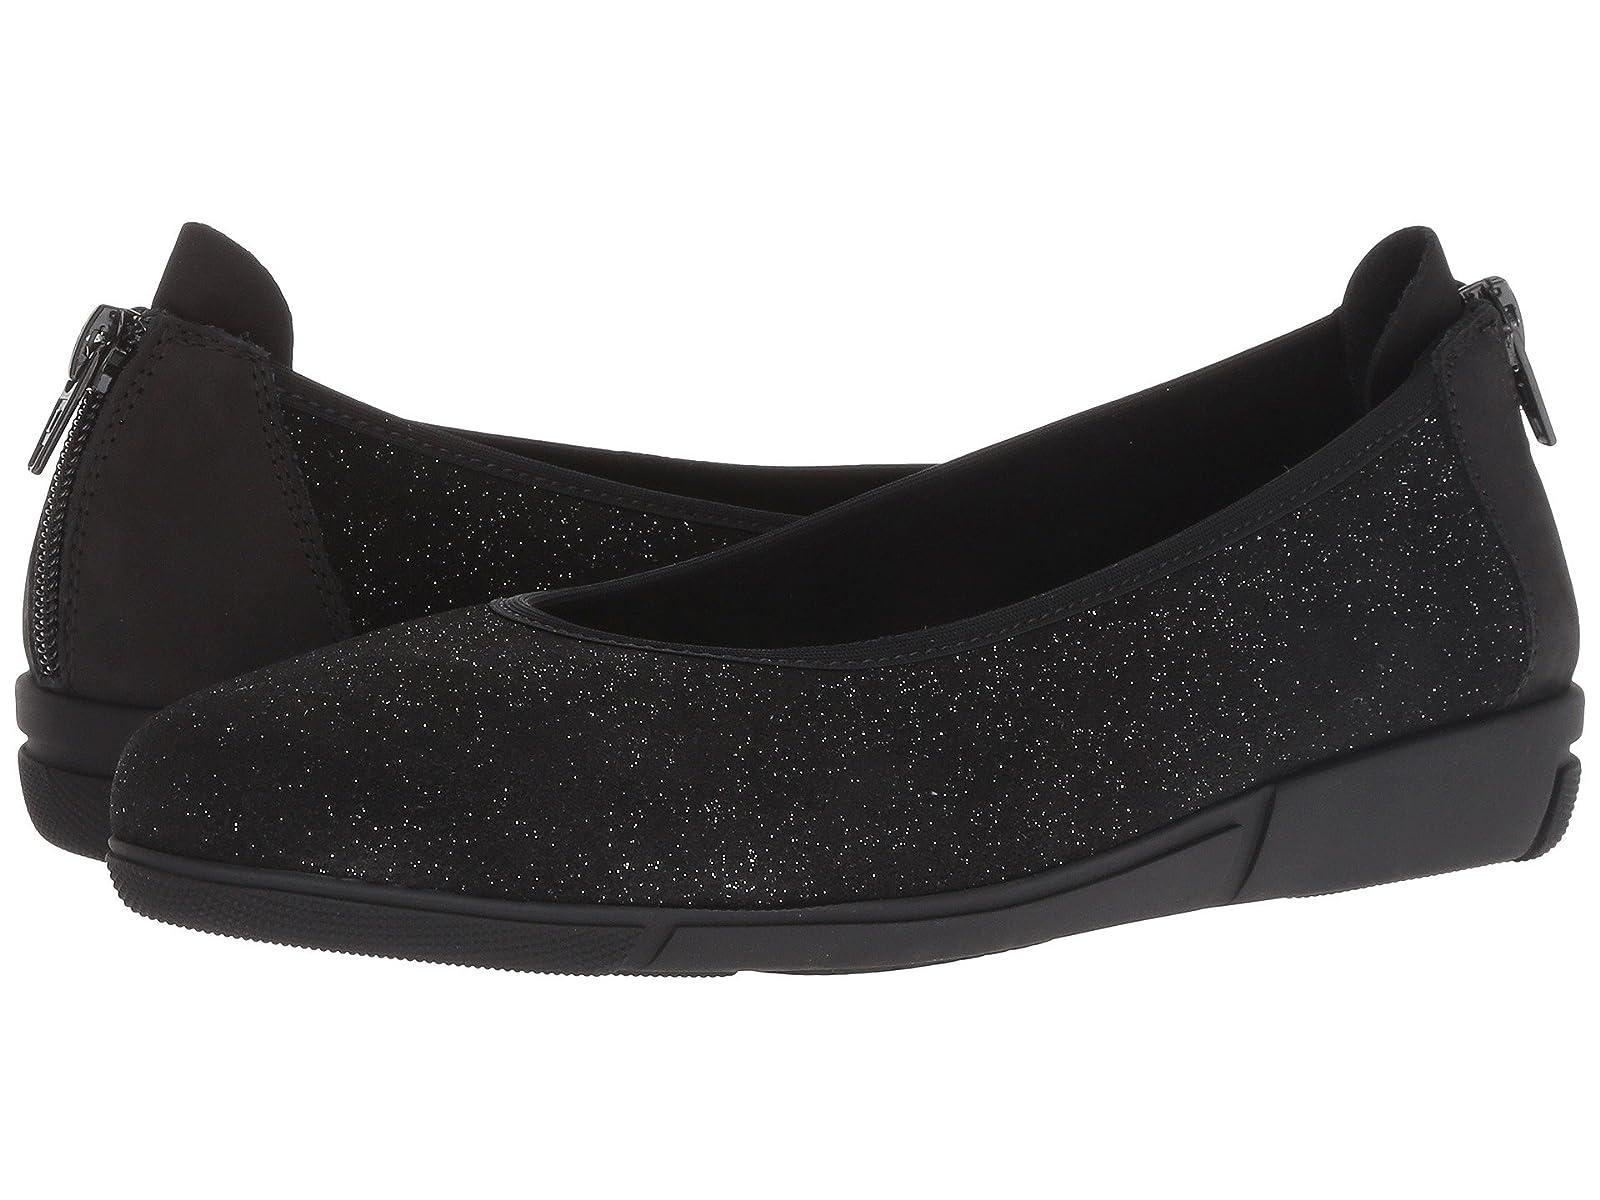 Sesto Meucci DinnieAtmospheric grades have affordable shoes